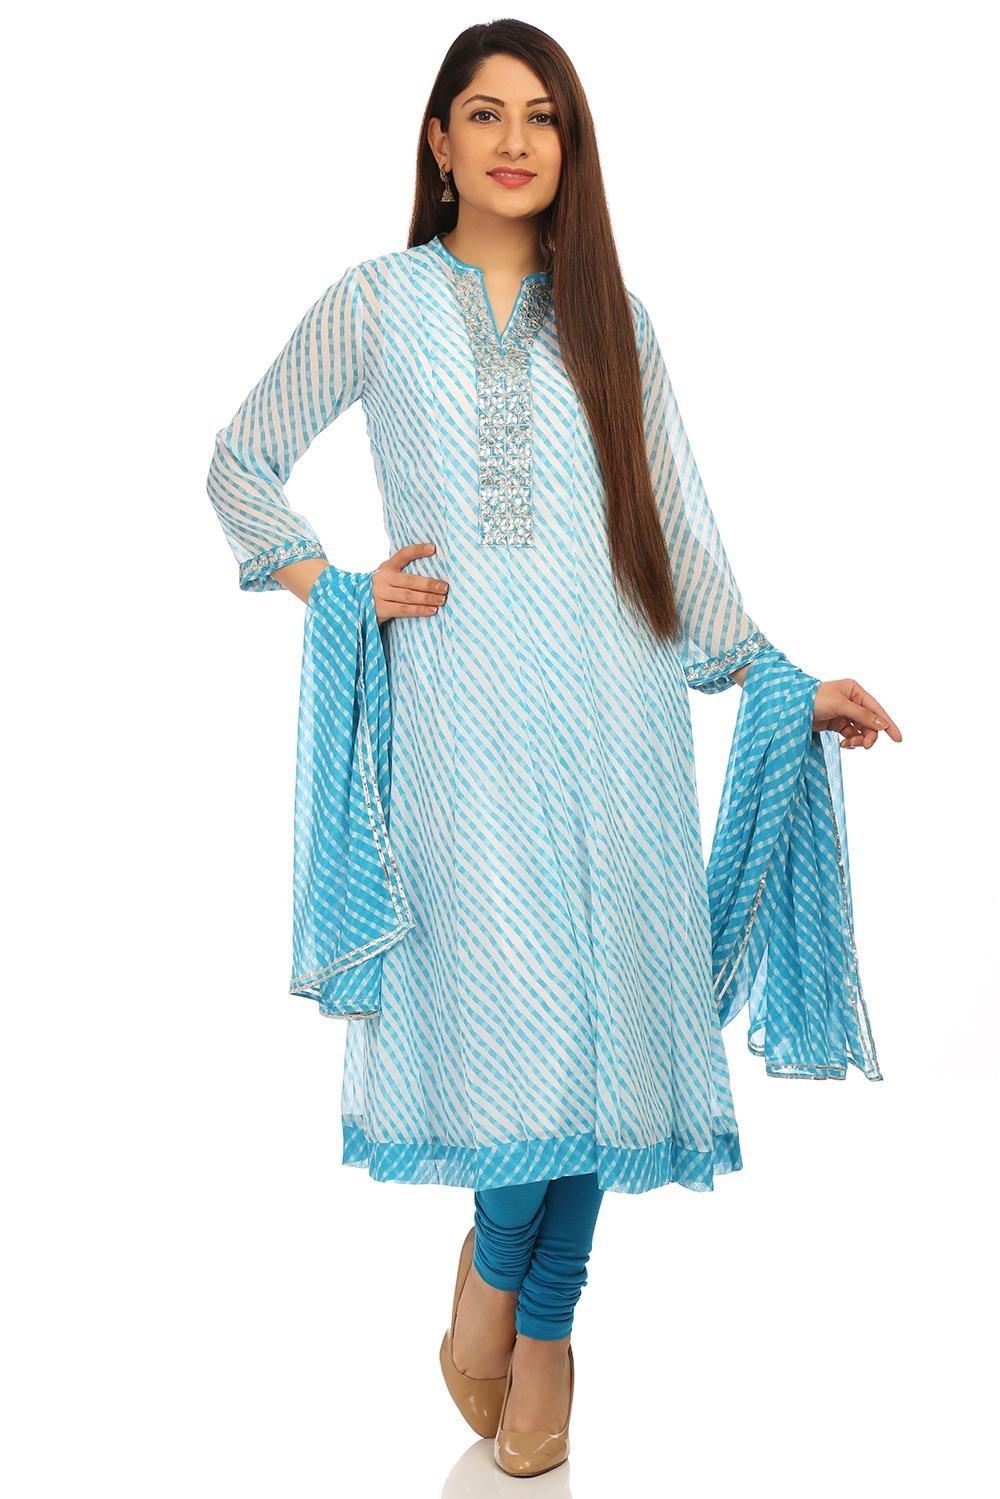 BIBA Women's Sky Blue Kalidar Poly Cotton Crepe & Roto Suit Set Size 38